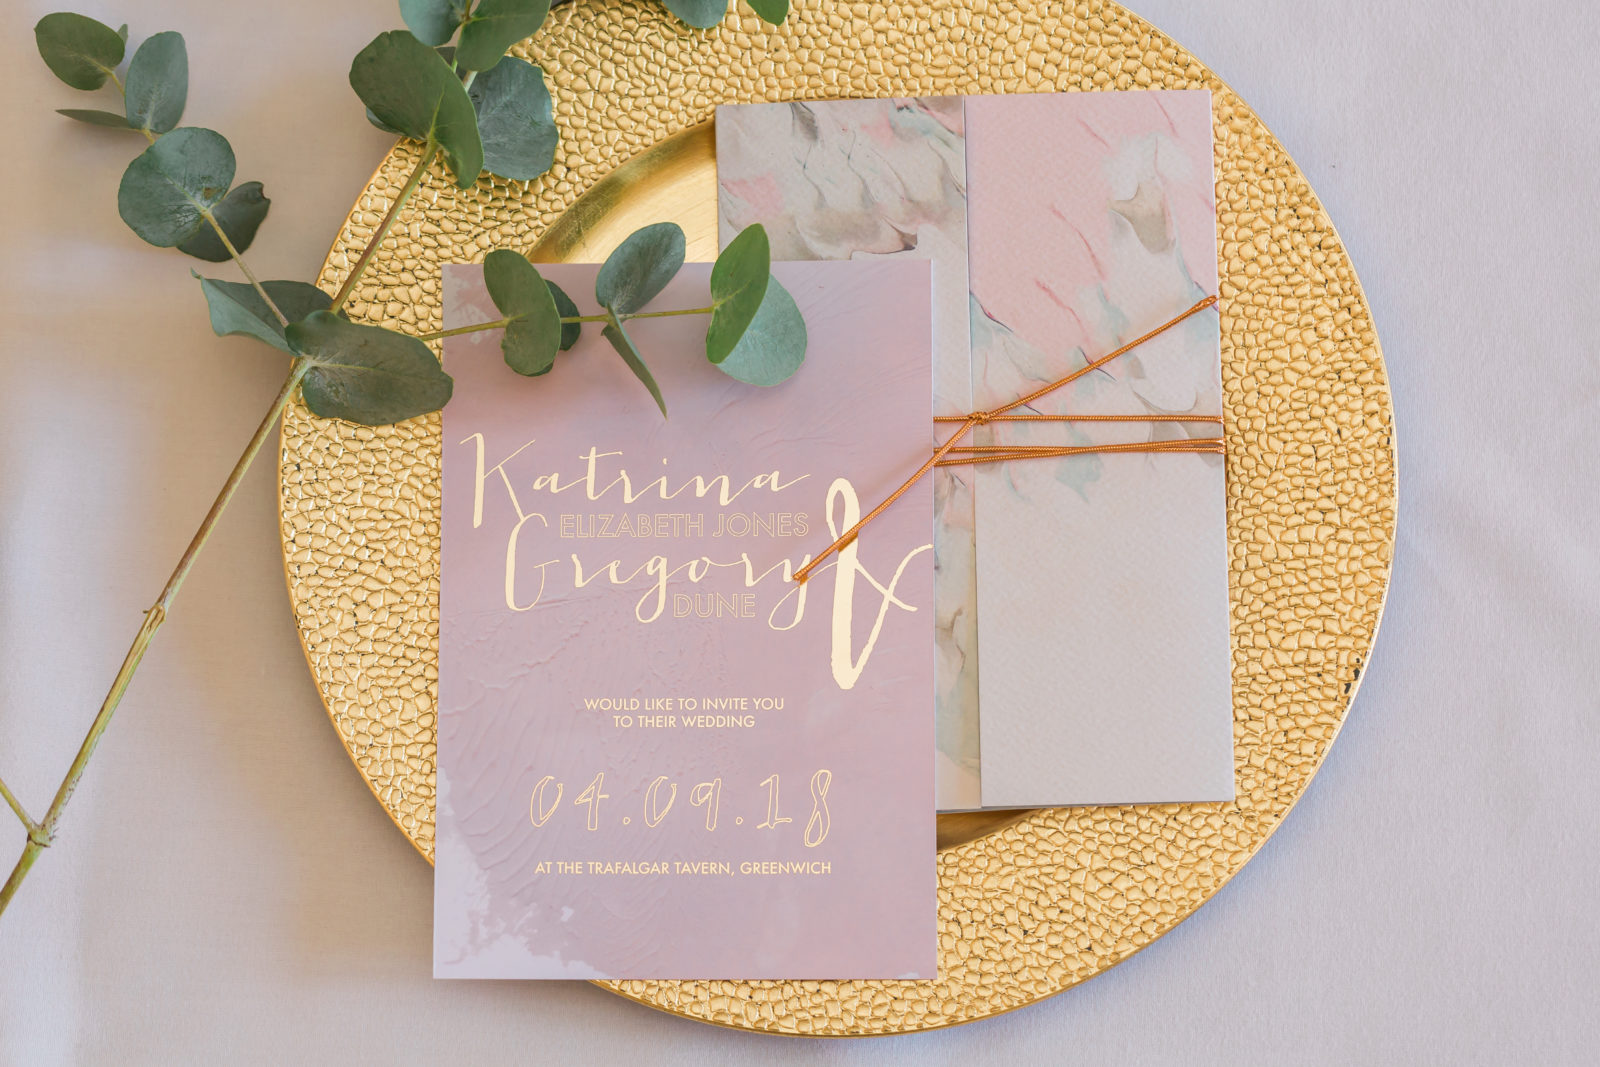 soft-pink-wedding-stationery.jpg